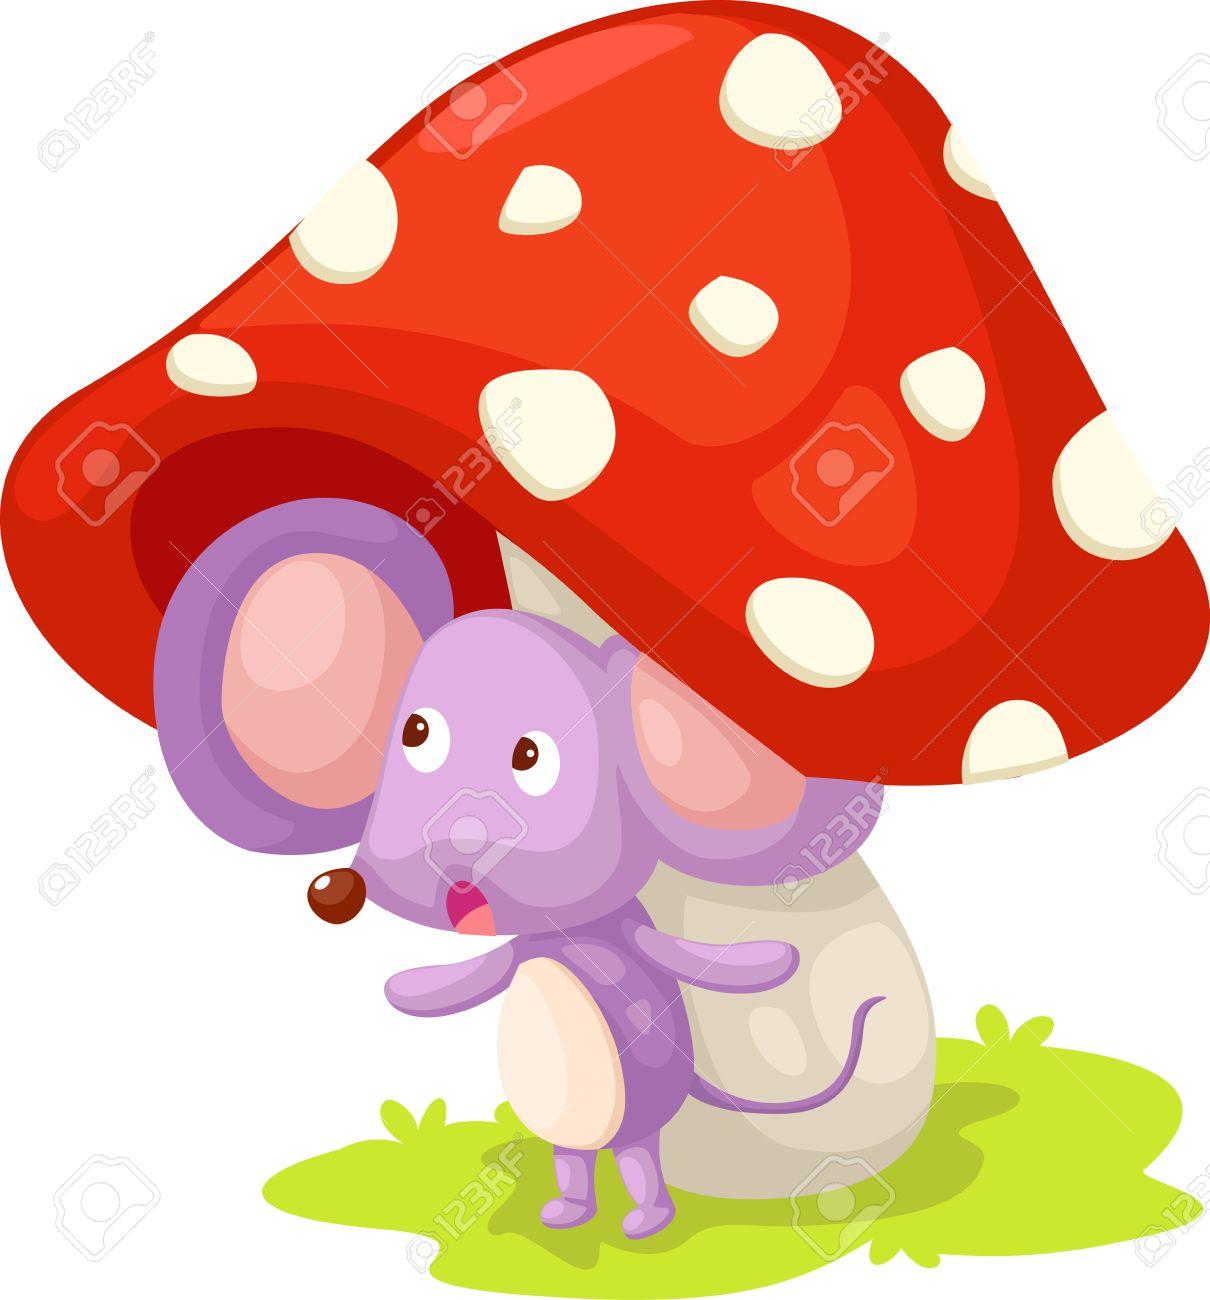 Mushroom Cap Stock Photos & Pictures. Royalty Free Mushroom Cap.